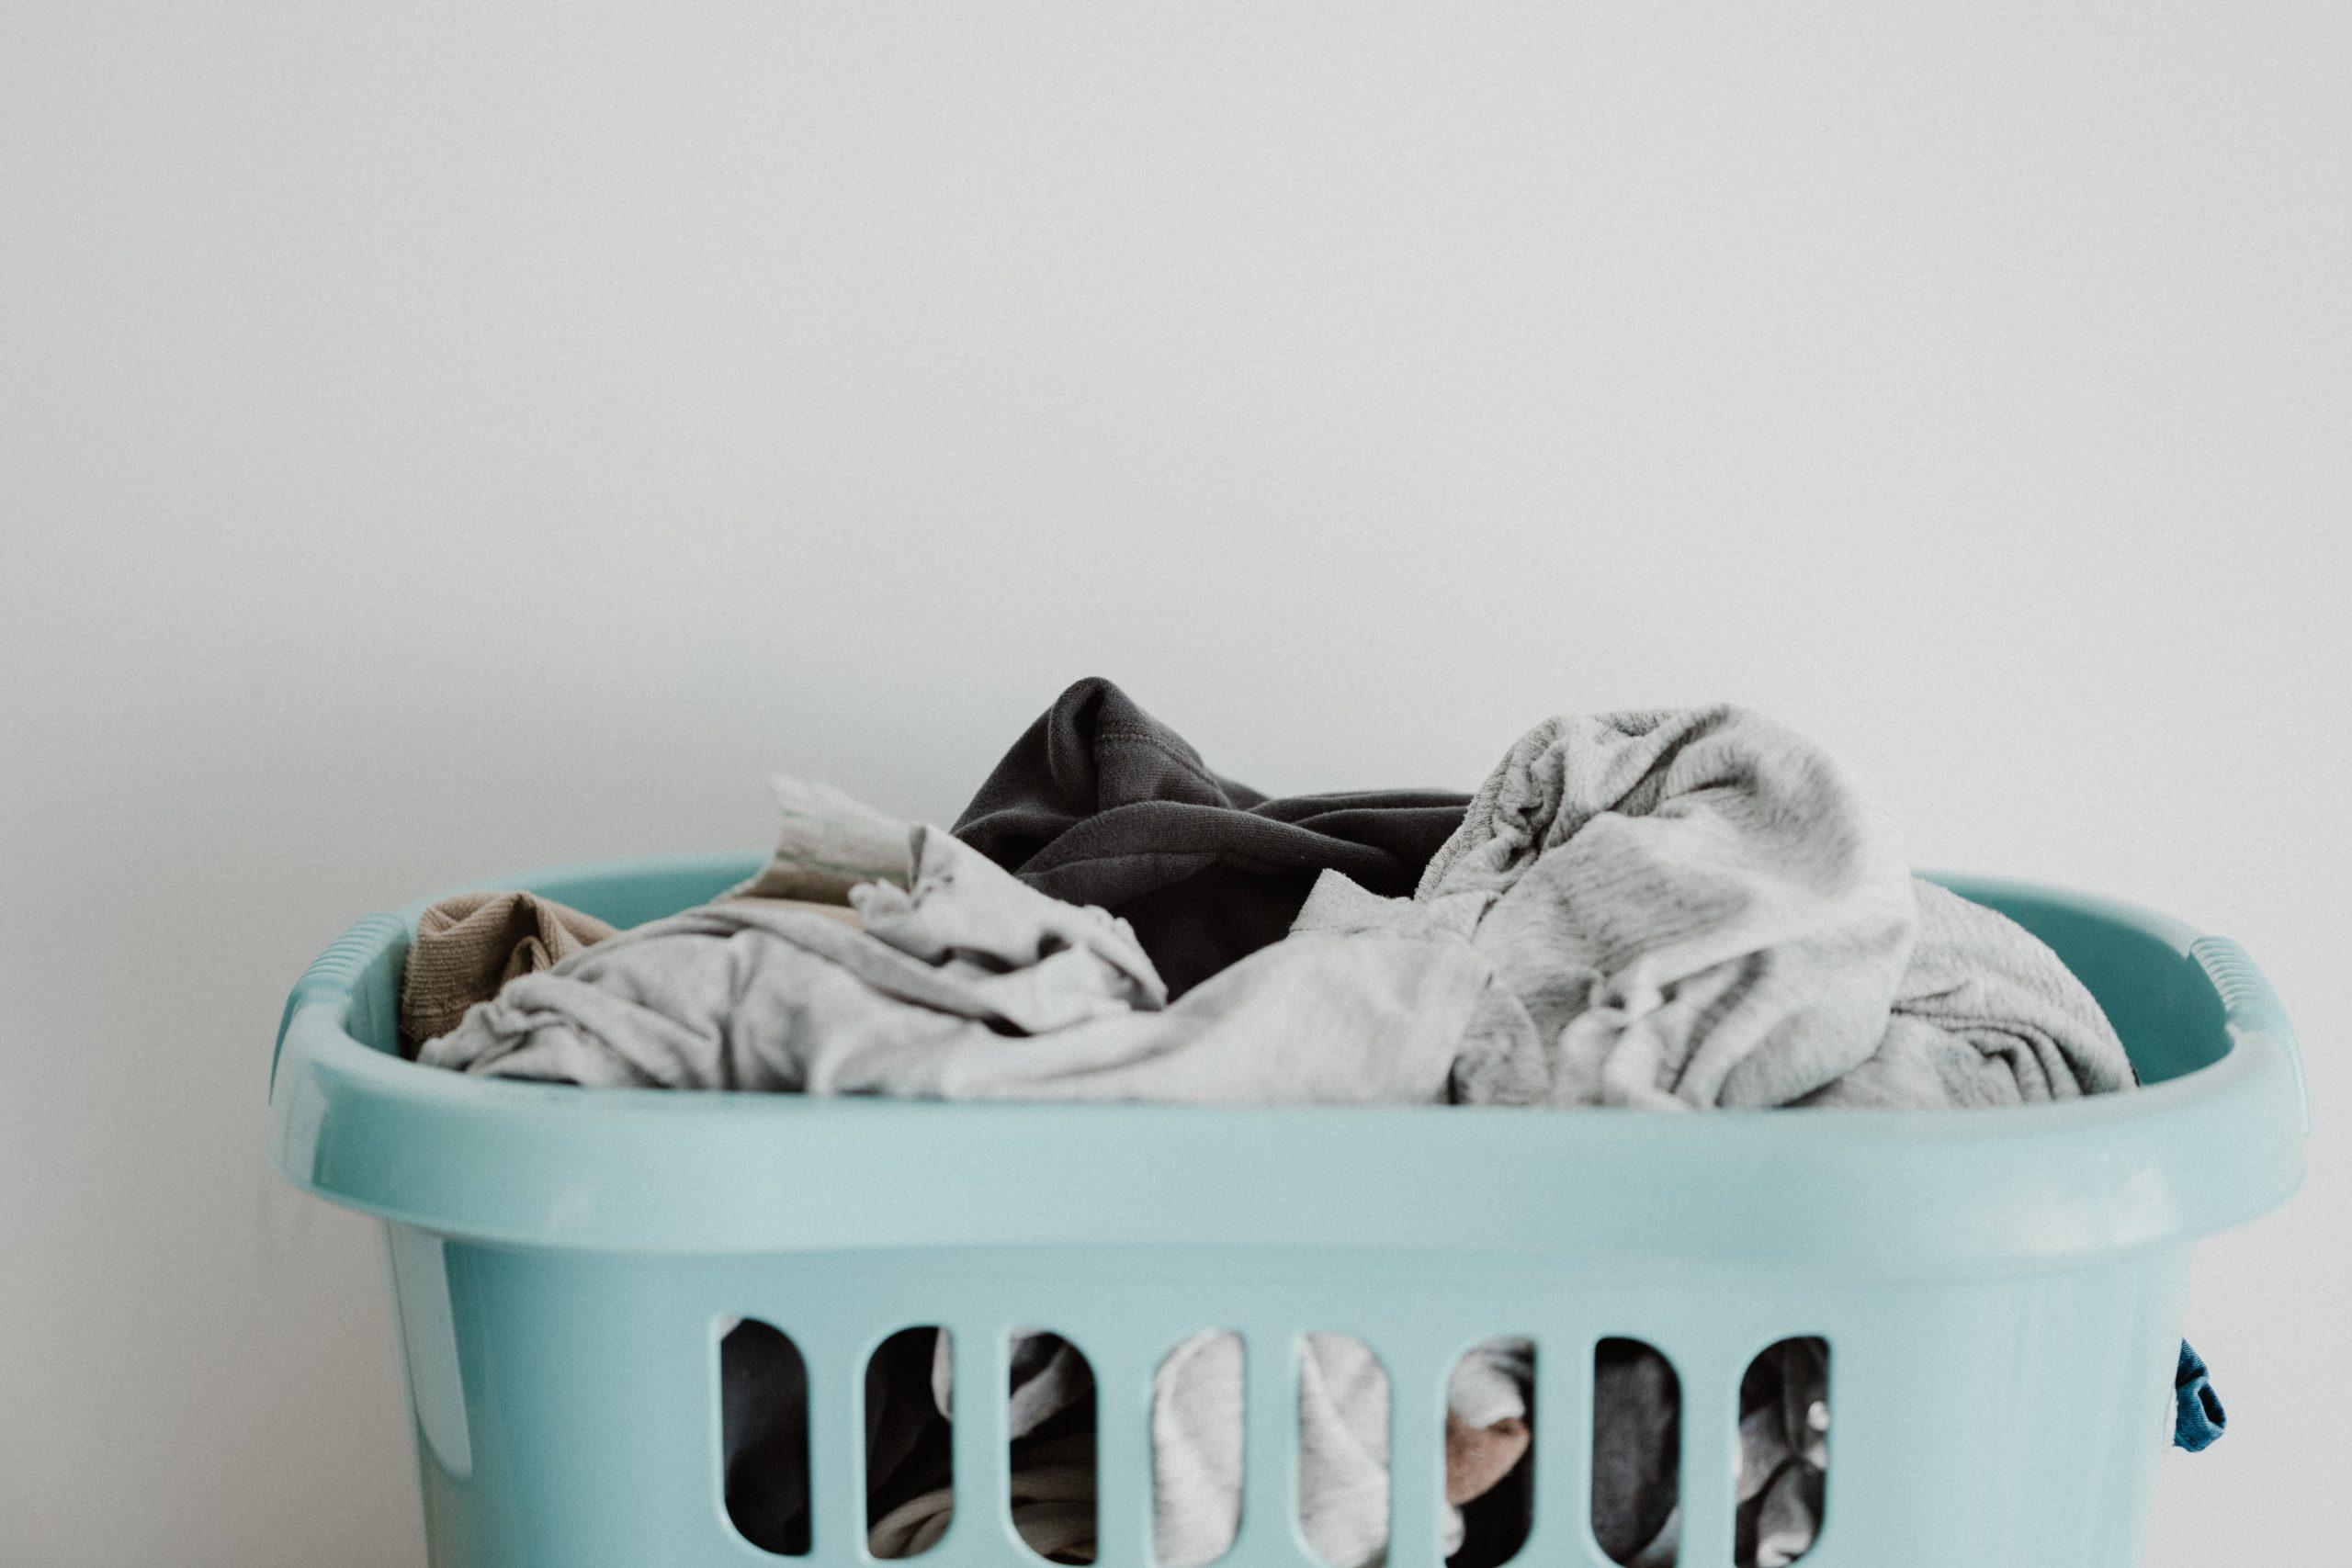 Laundry basket full of clothes Eco-friendly laundry